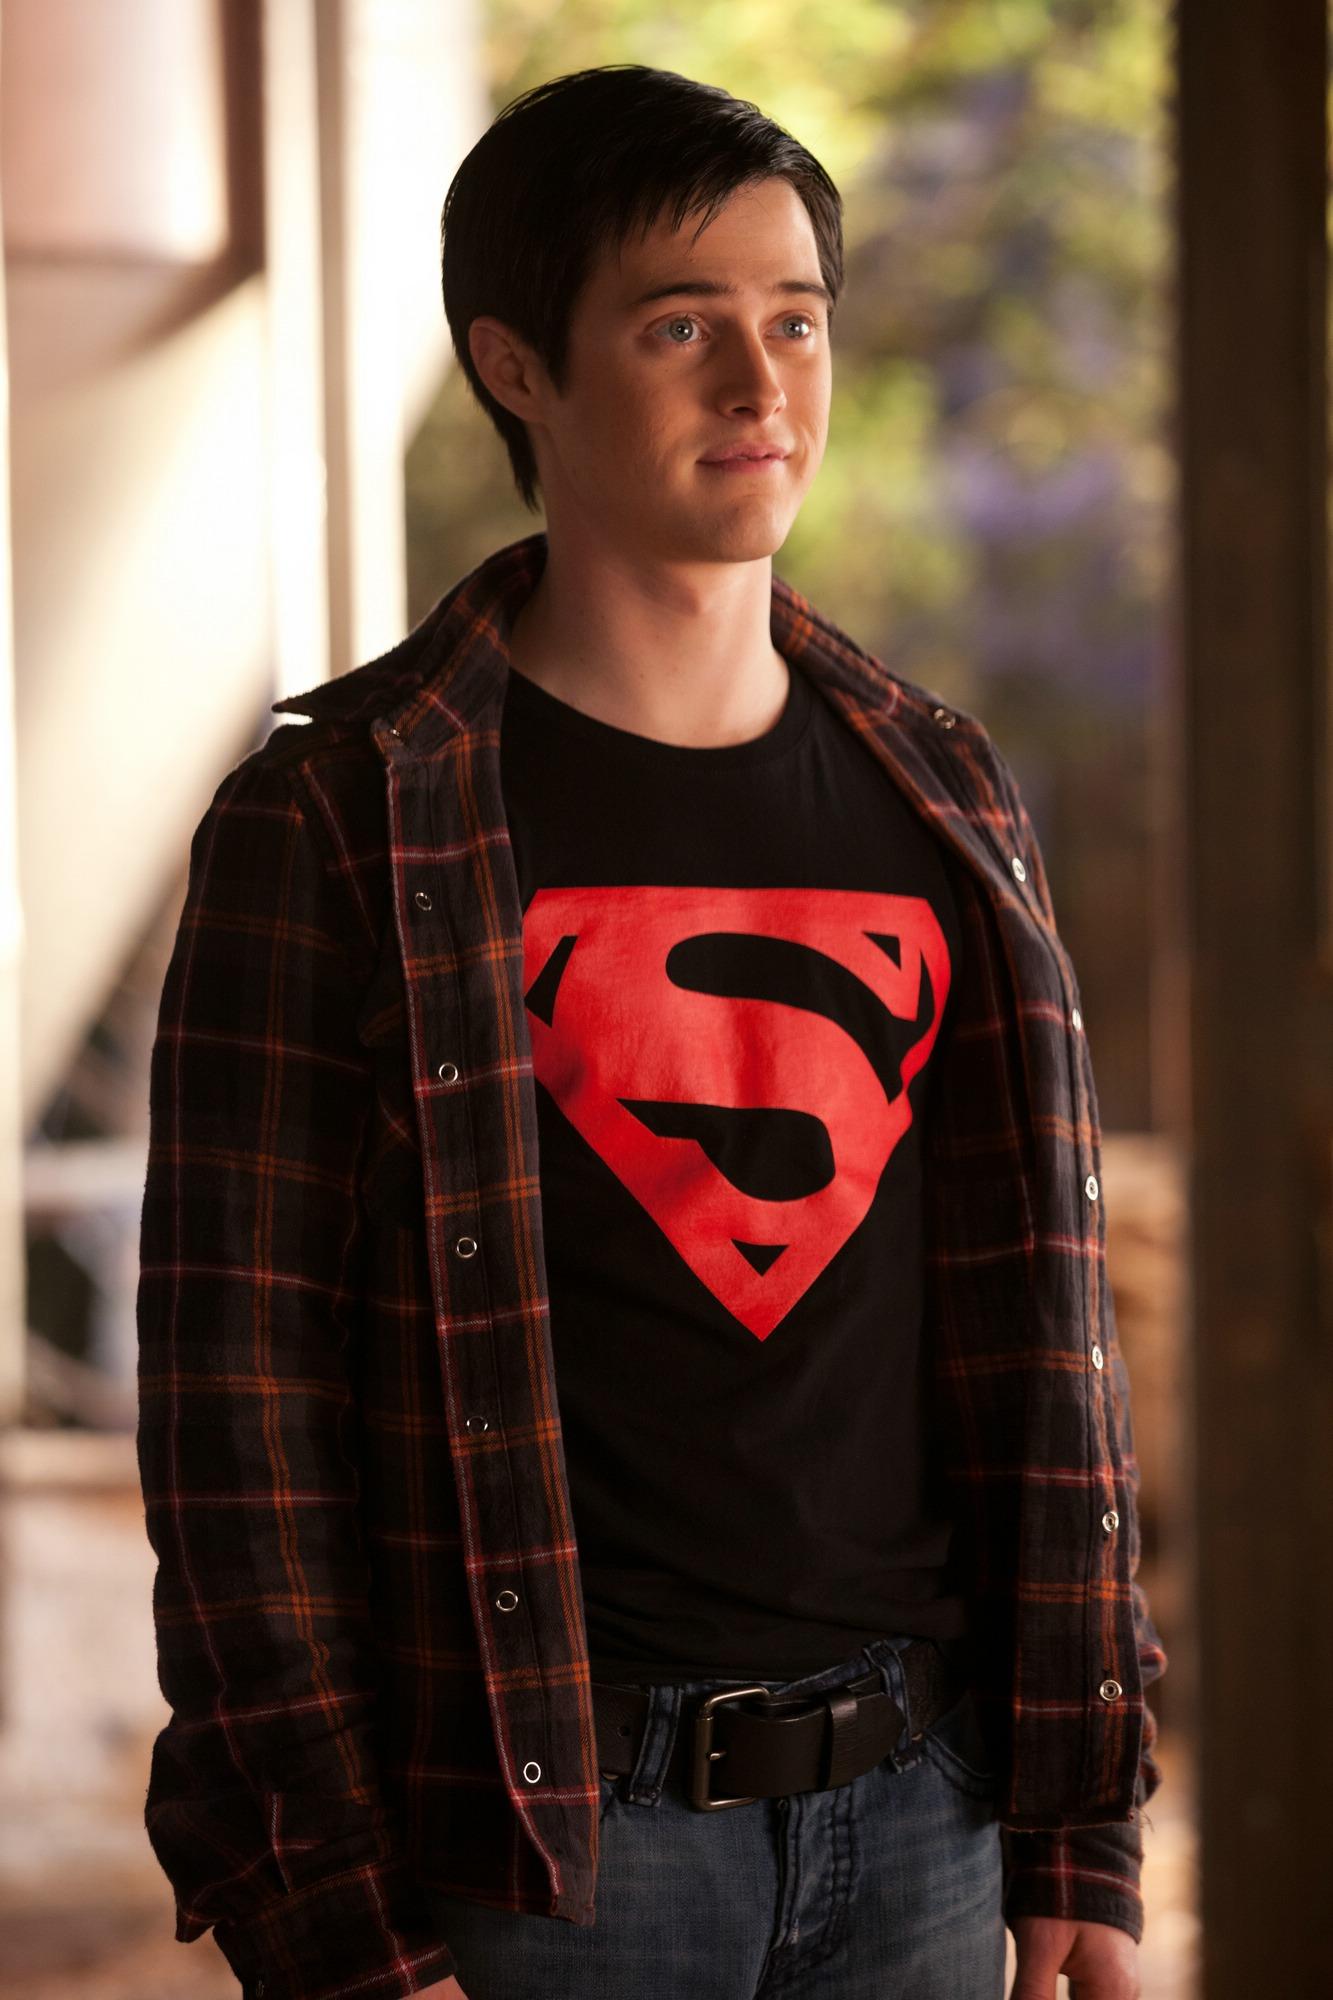 LX-15 (Smallville)